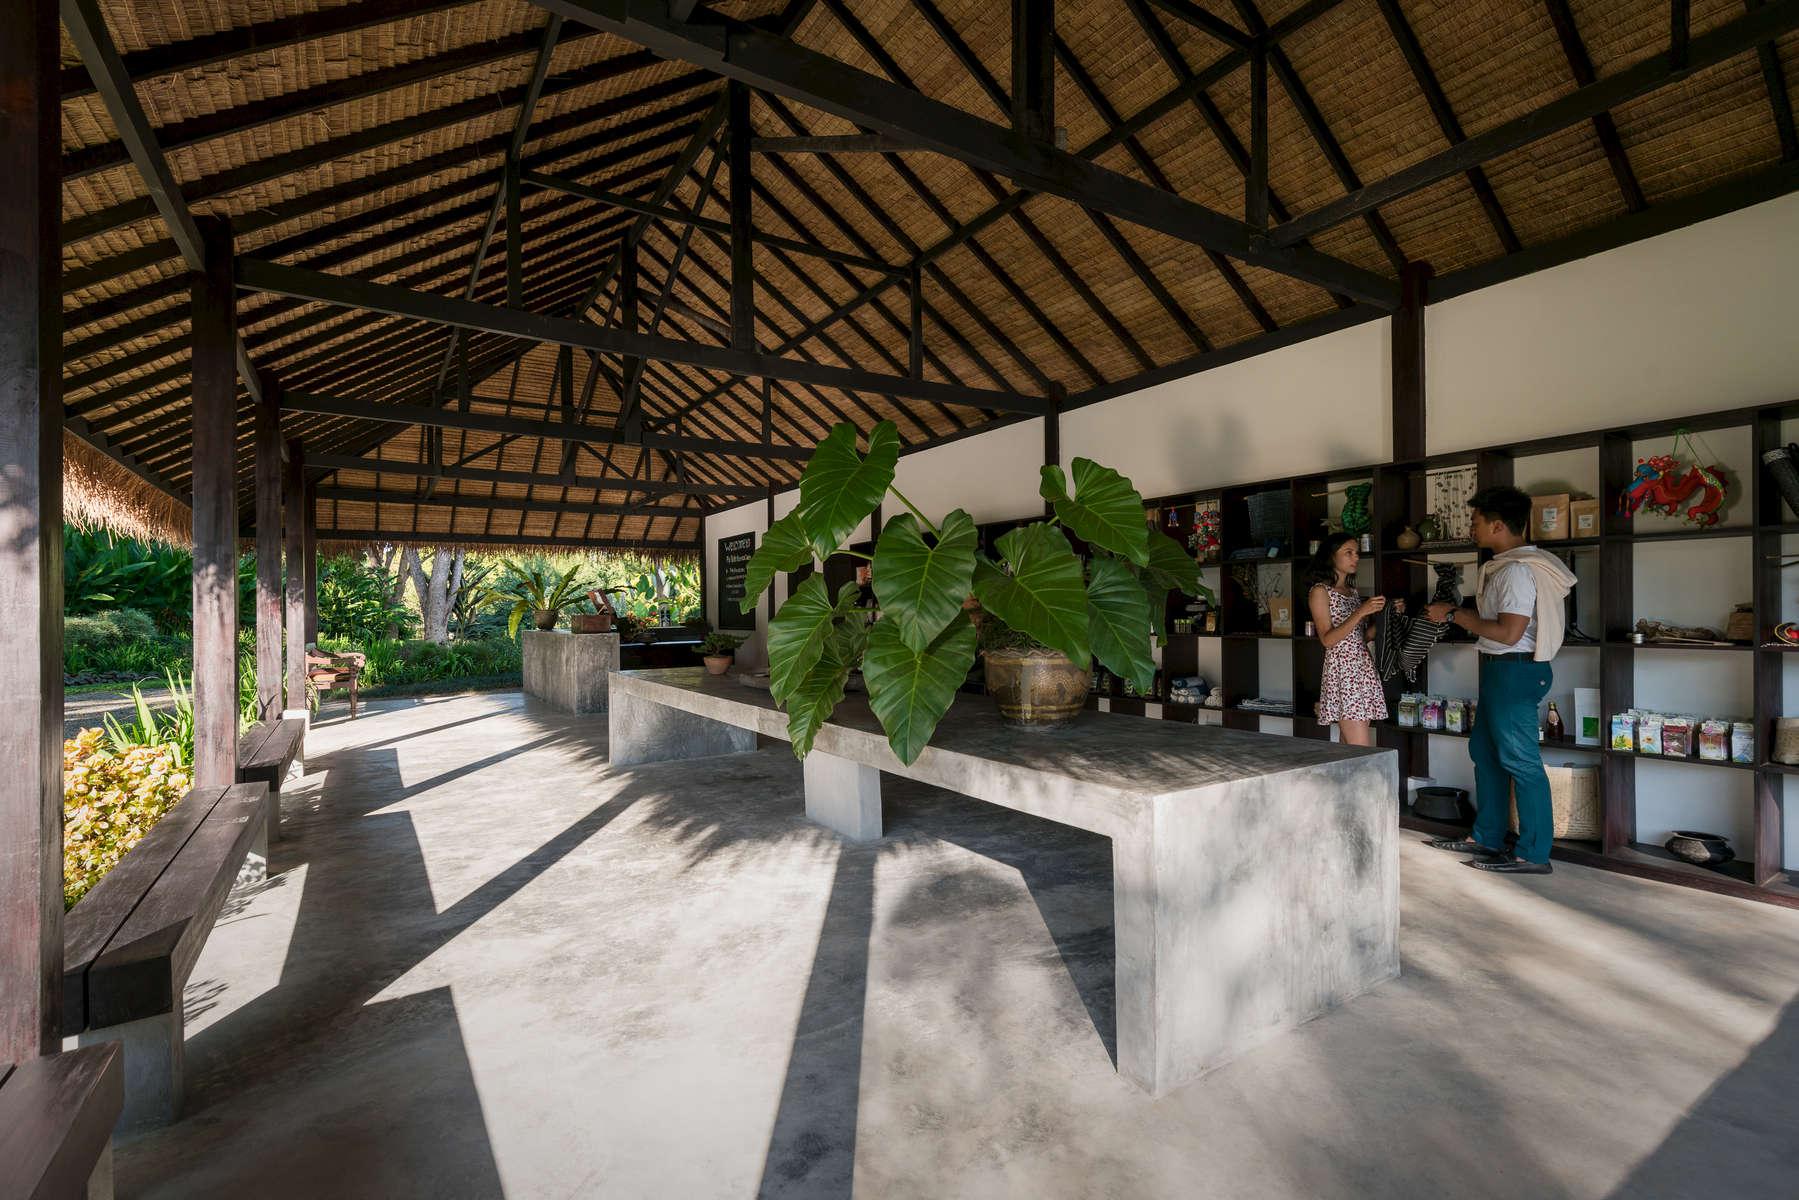 Laos-Luang-Prabang-Pha-Tad-Khe-Botanical-Garden-Photo-by-Cyril-Eberle-DSC04669-vignette